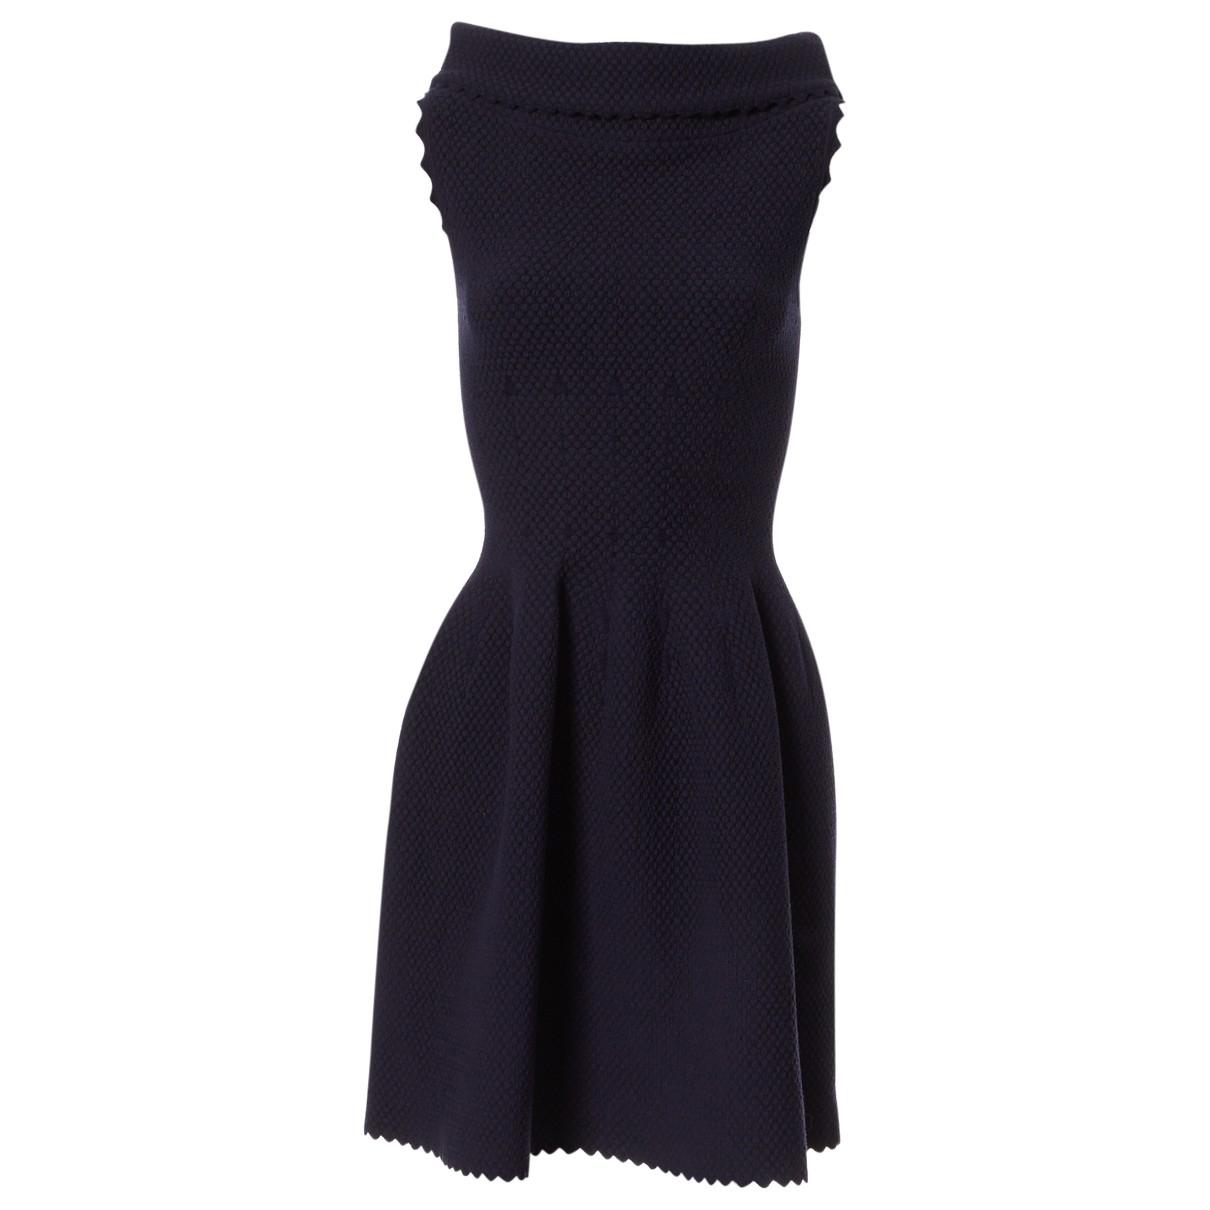 Alaïa \N Navy Wool dress for Women 38 FR